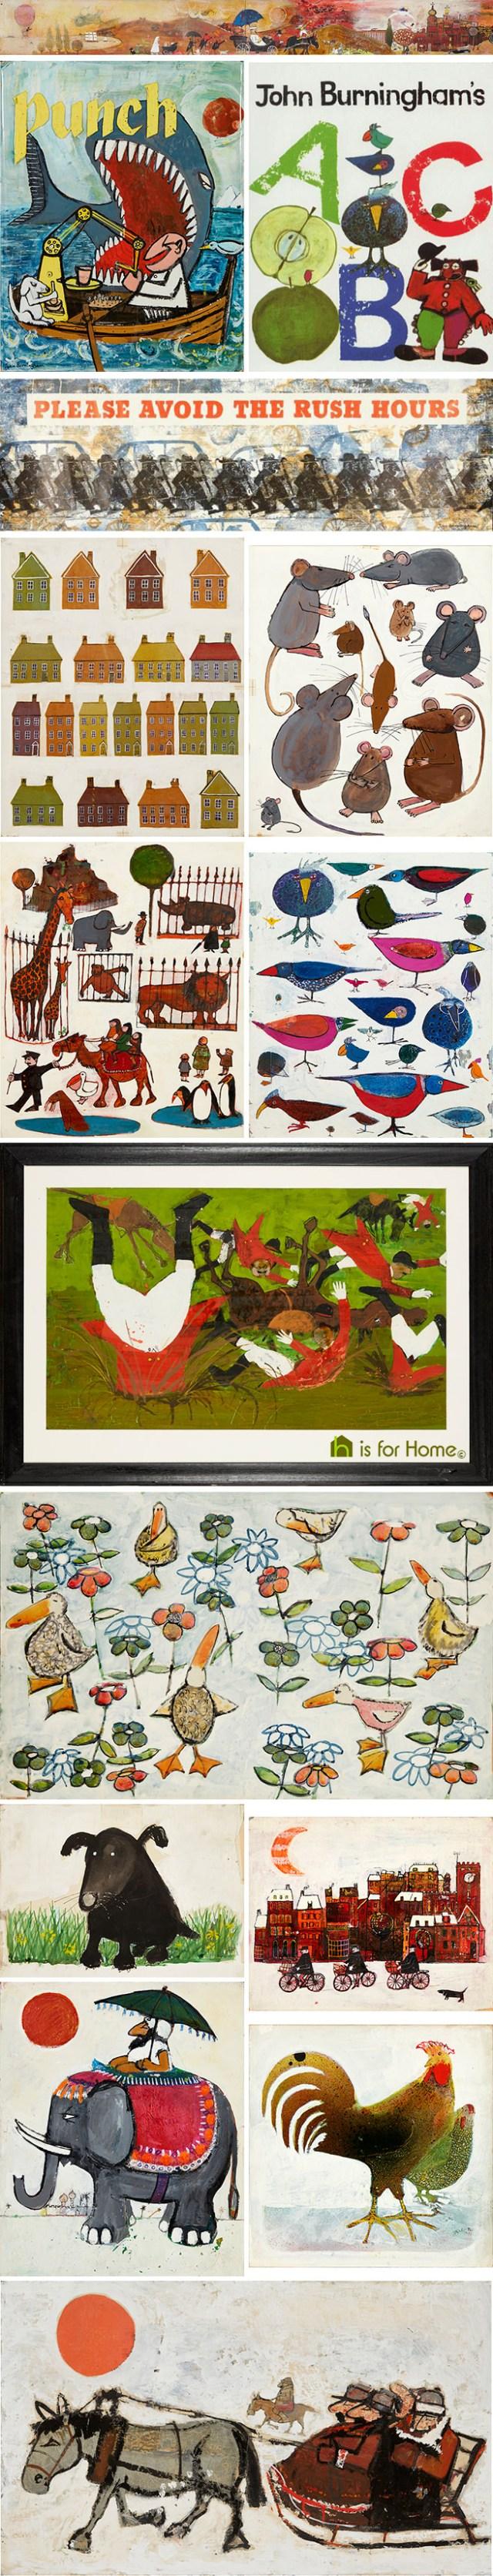 Mosaic of John Burningham illustrations | H is for Home